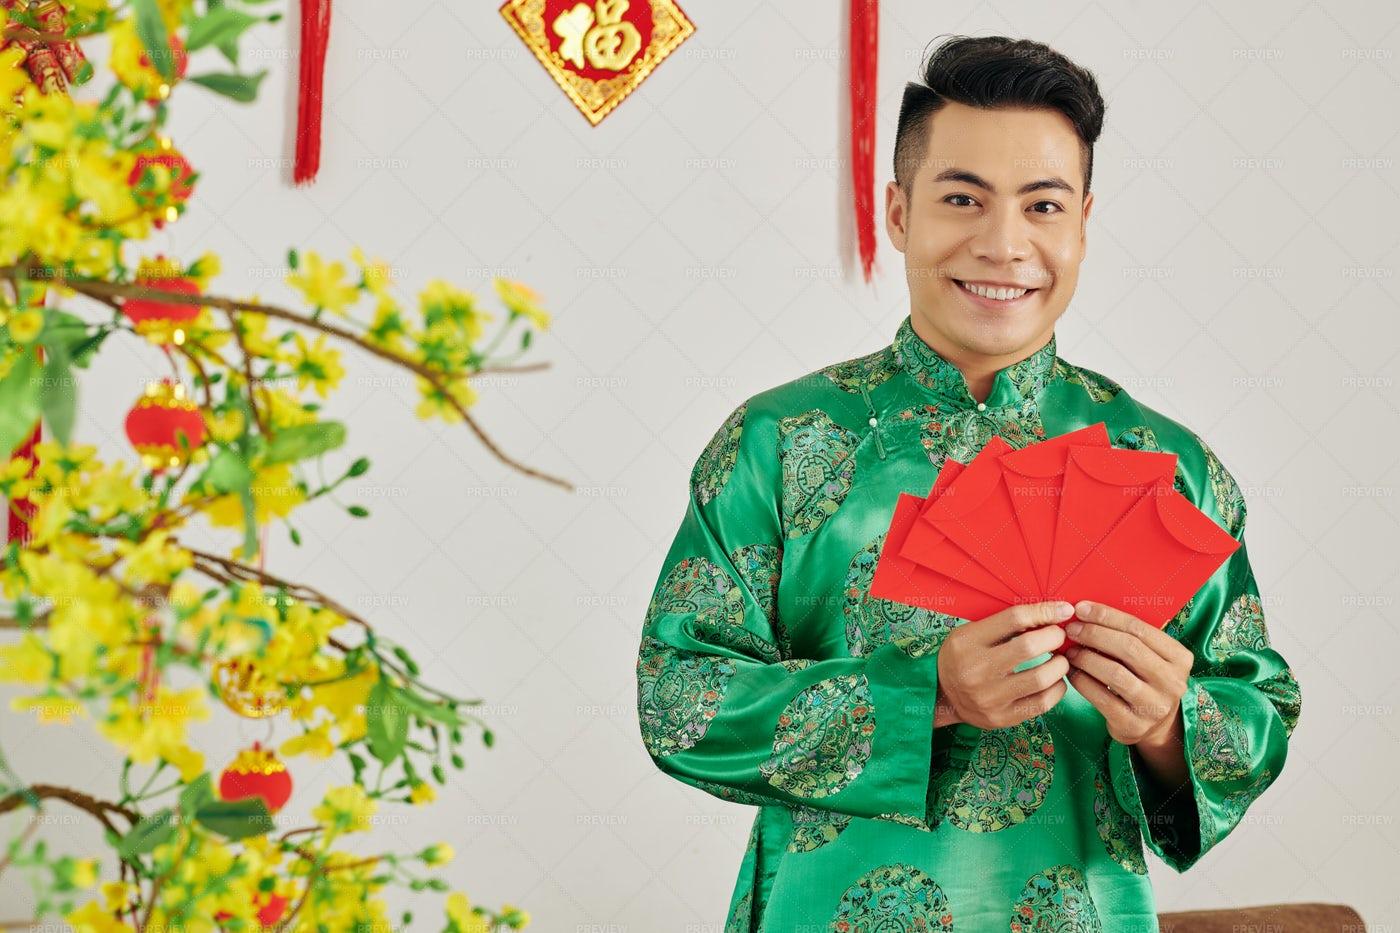 Man With Envelopes For Spring Festival: Stock Photos